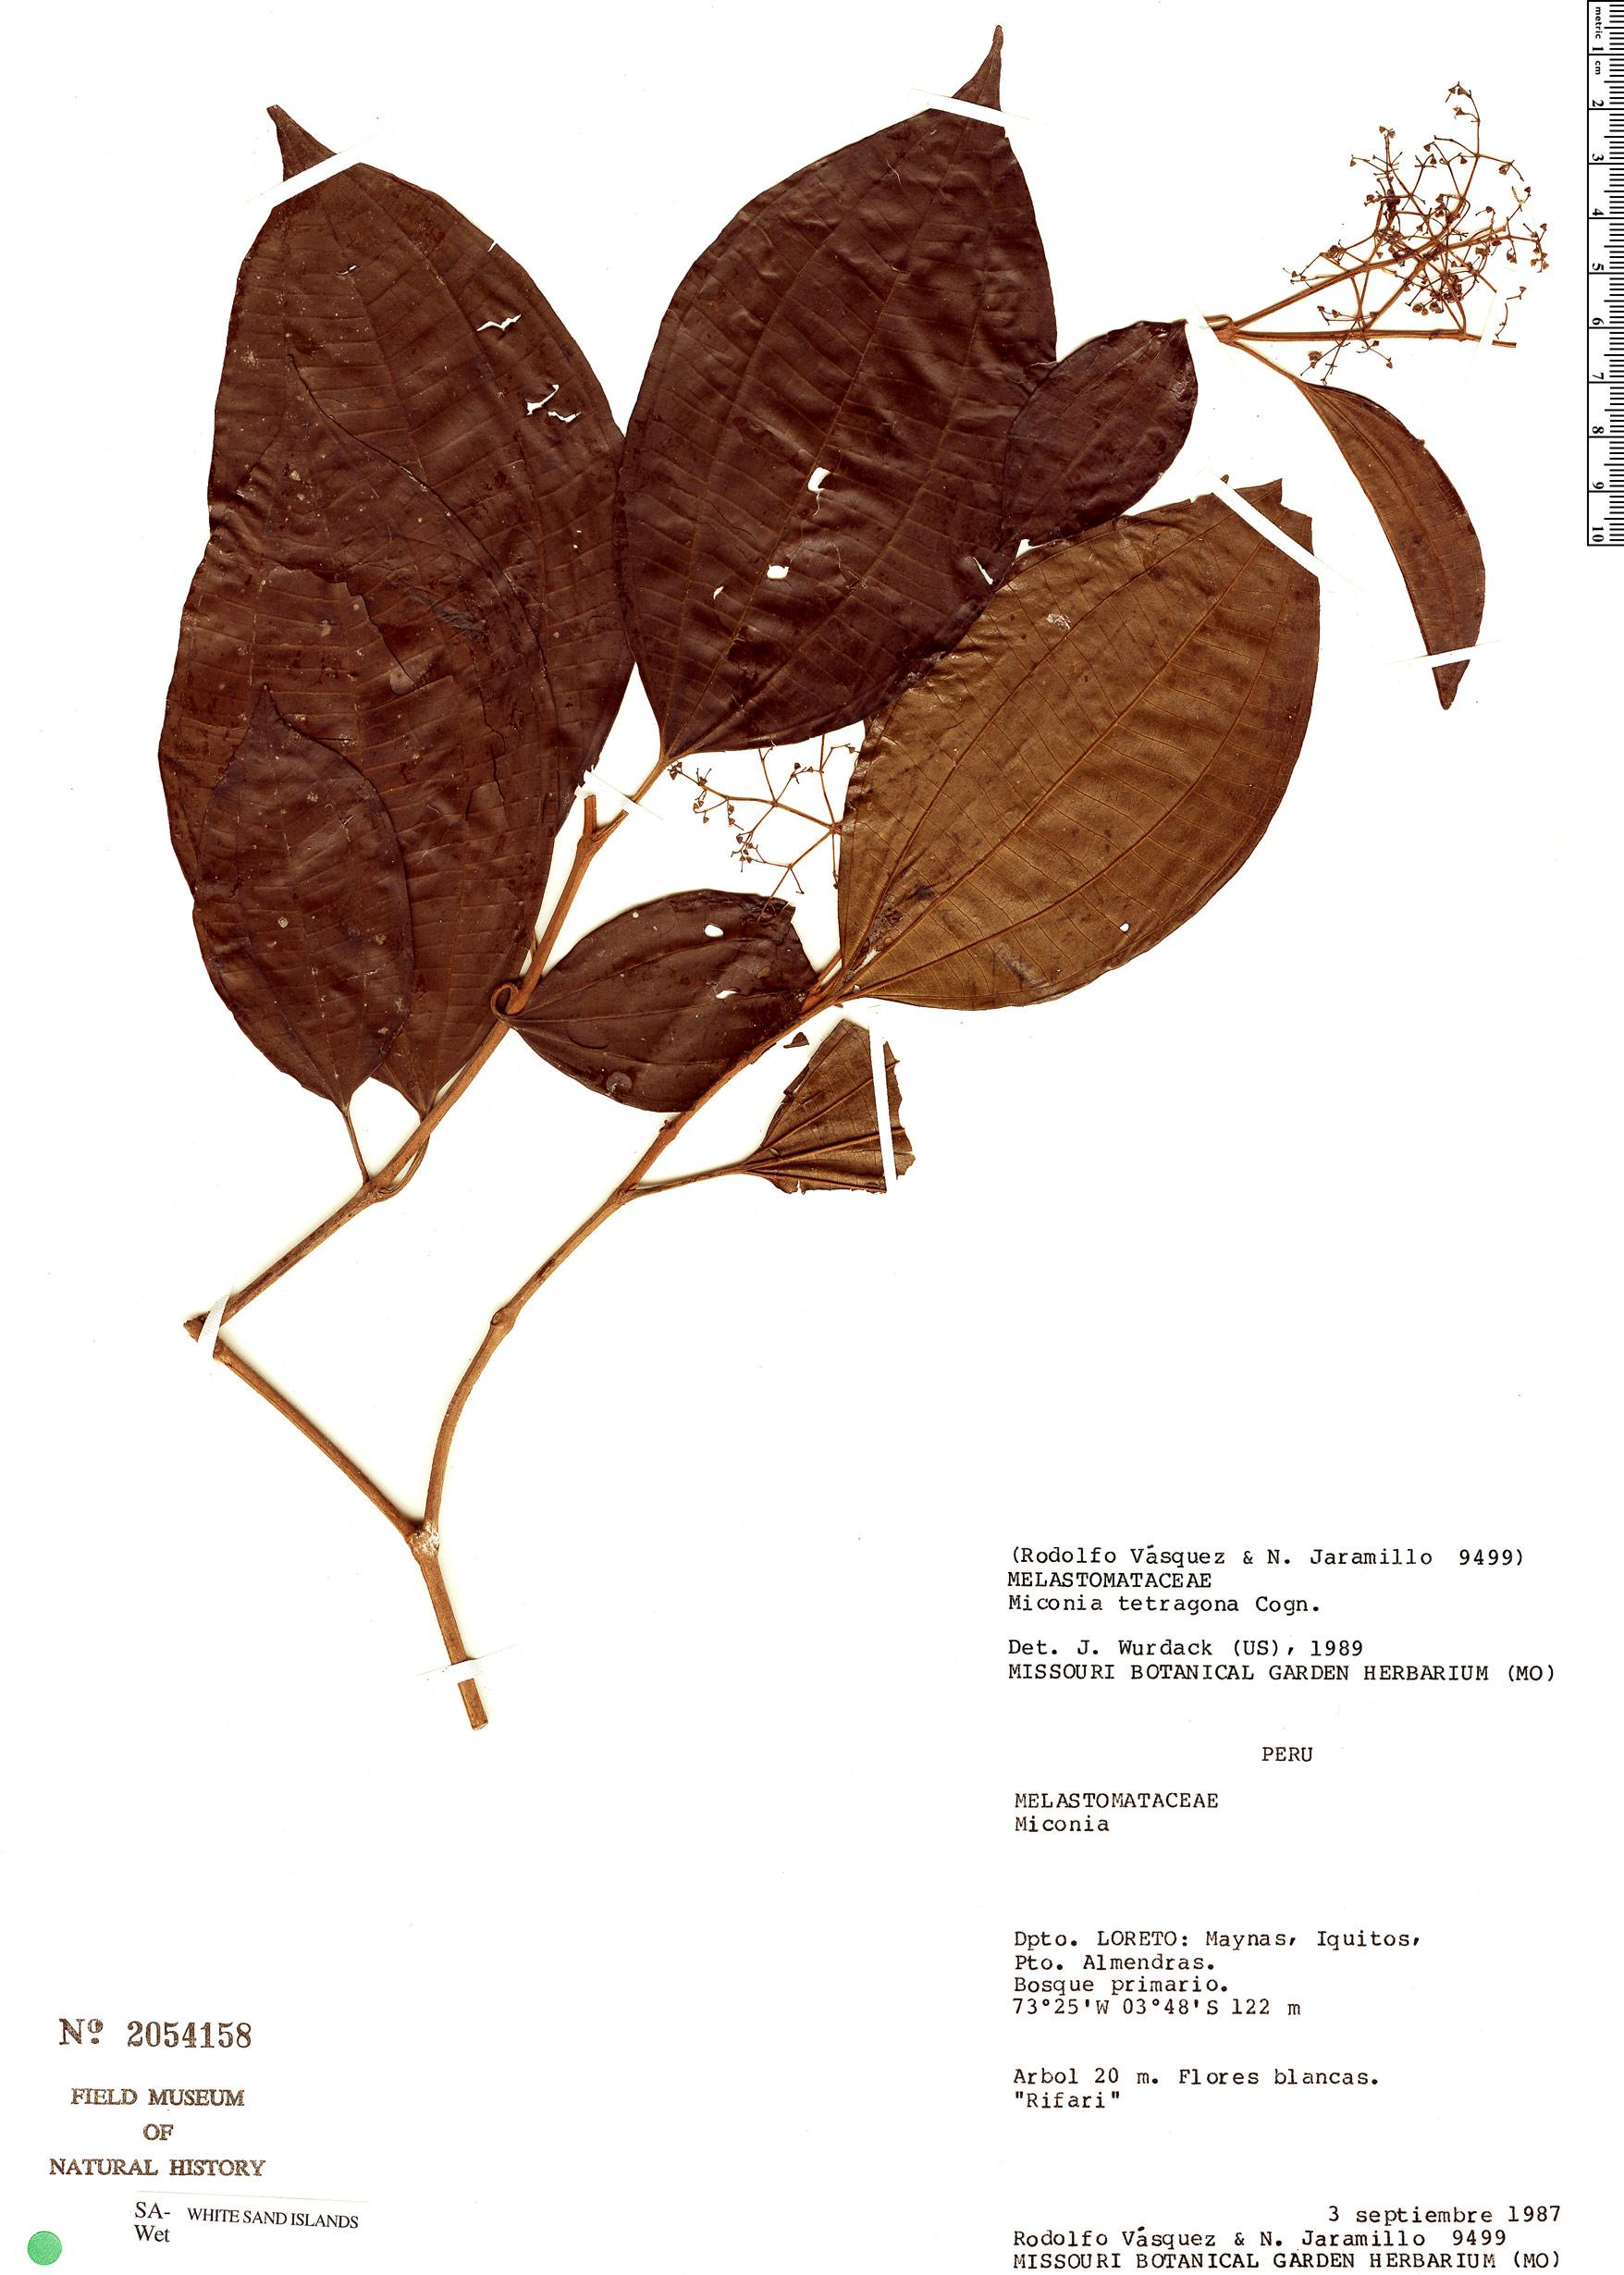 Specimen: Miconia tetragona